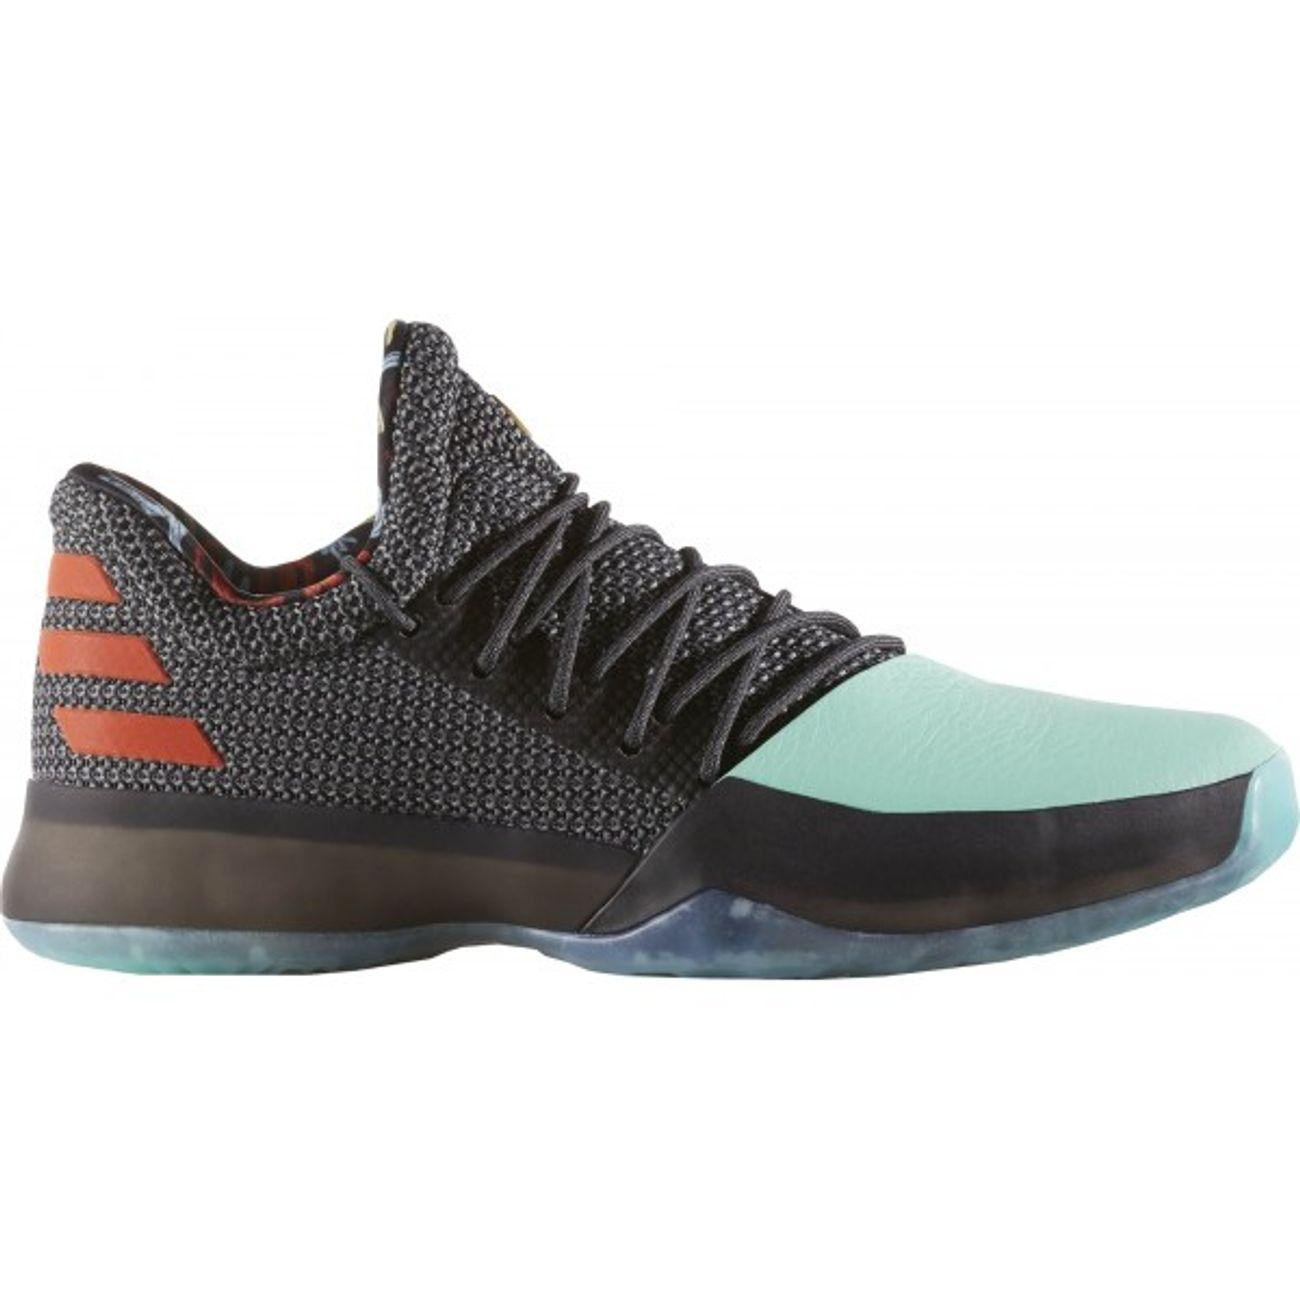 Basket ball adulte ADIDAS Adidas - Chaussure de Basketball adidas James Harden Vol.1 Cactus Pointure - 50